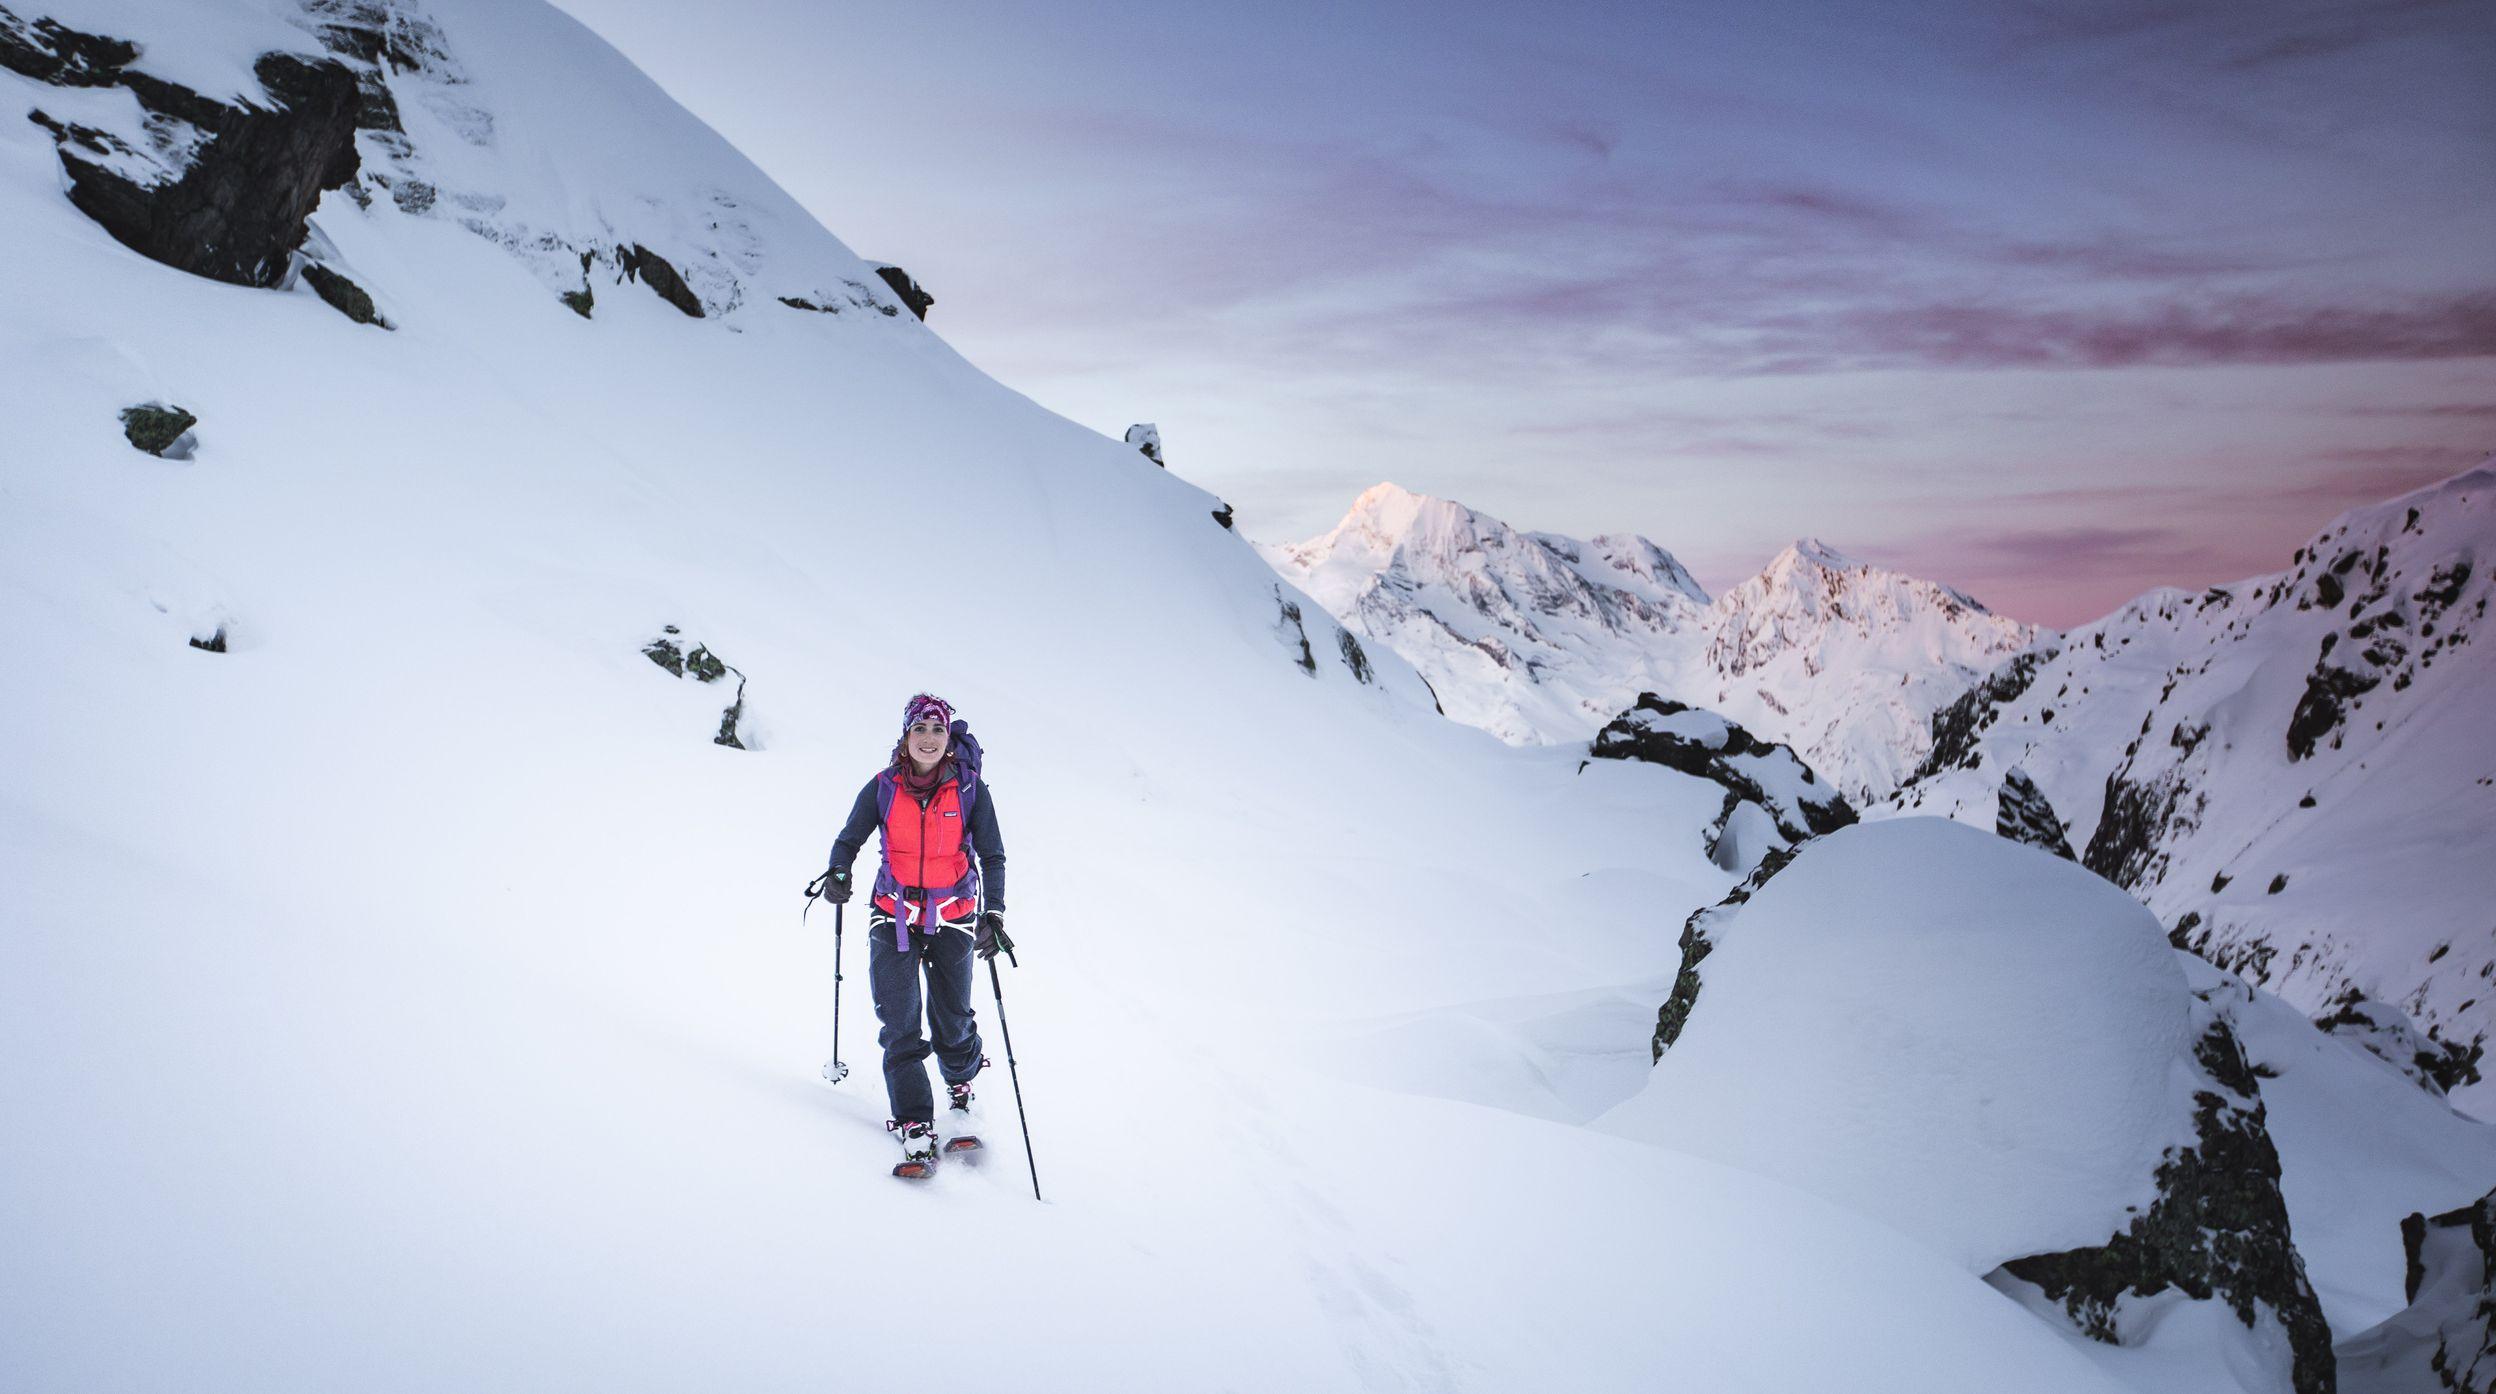 Lise BILLON Séjour Picture Shelter Snowboard refuge ruitor Nathan Pyr